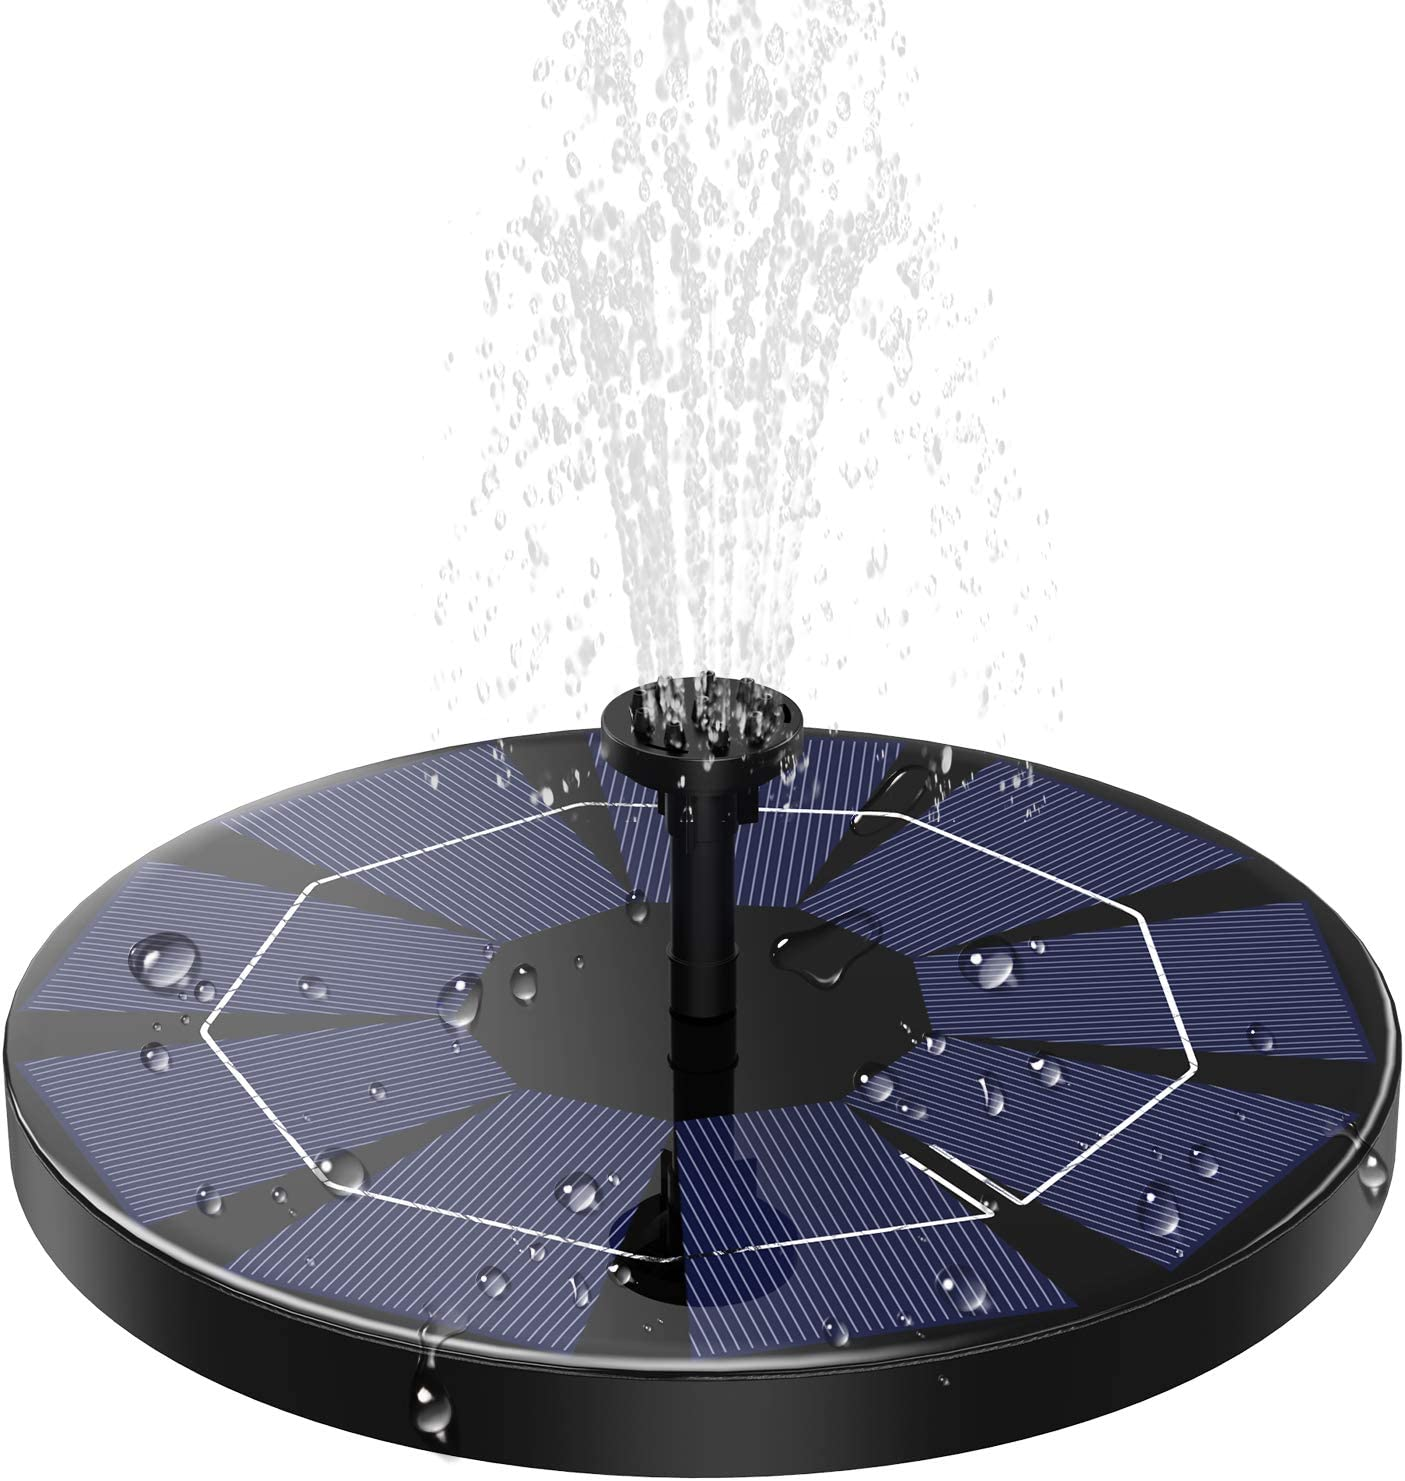 AD ADTRIP 3.0W Solar Fountain for Bird Bath with 1200mAh Battery Backup, Solar Powered Fountain Pump Solar Bird Bath Fountains for Outdoor, Garden, Small Pond, Pool with 6 Nozzles